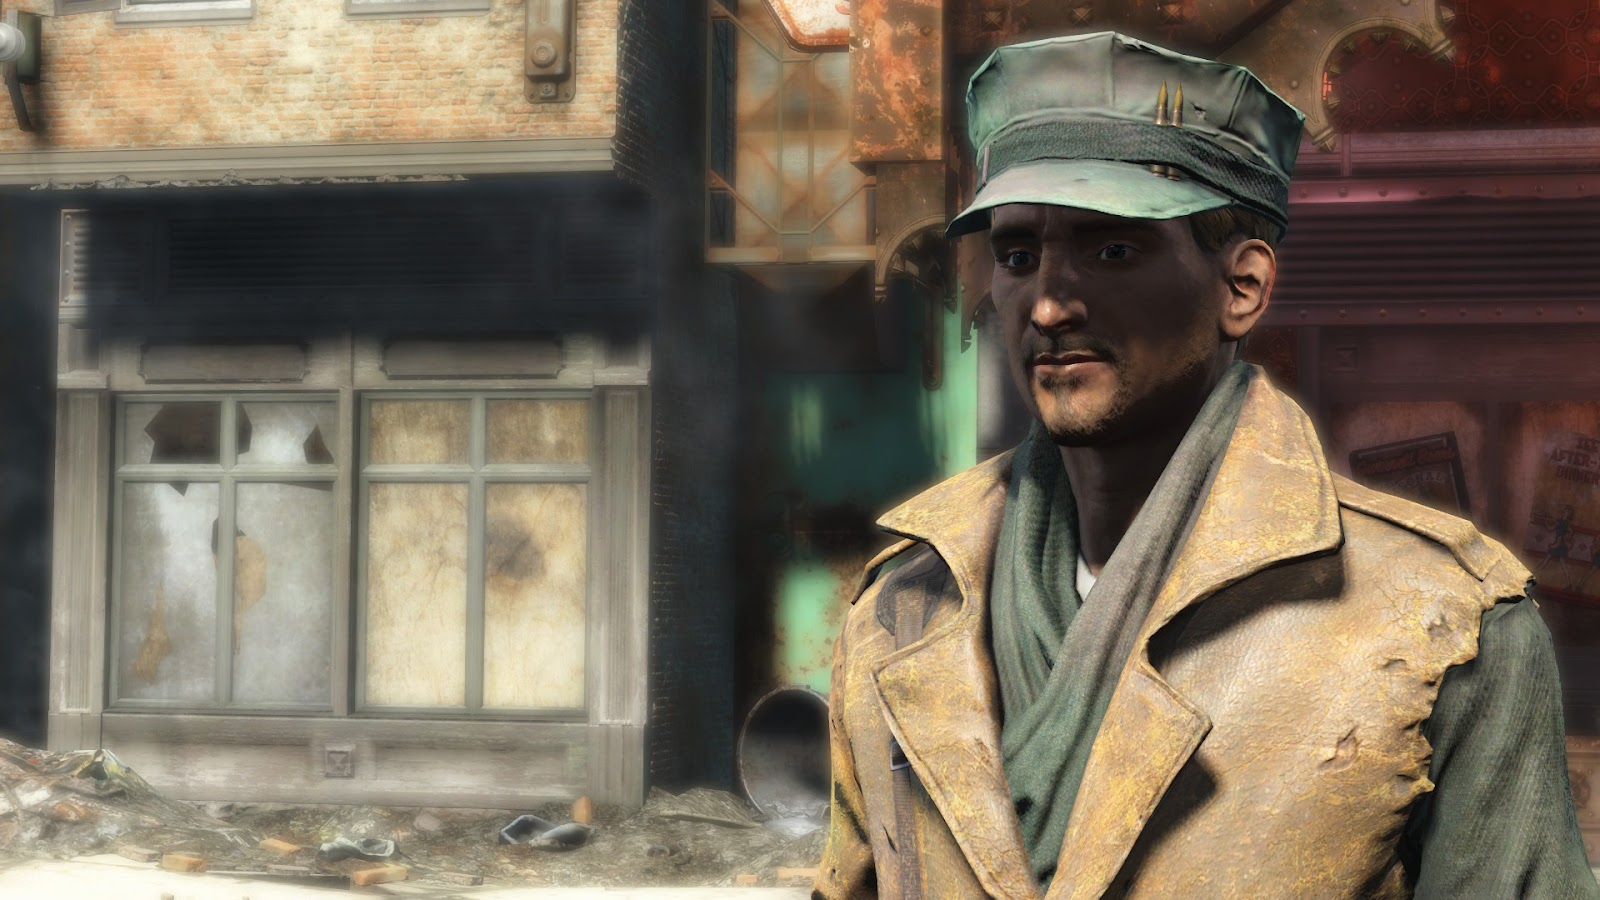 MacCready fallout 4 best companions